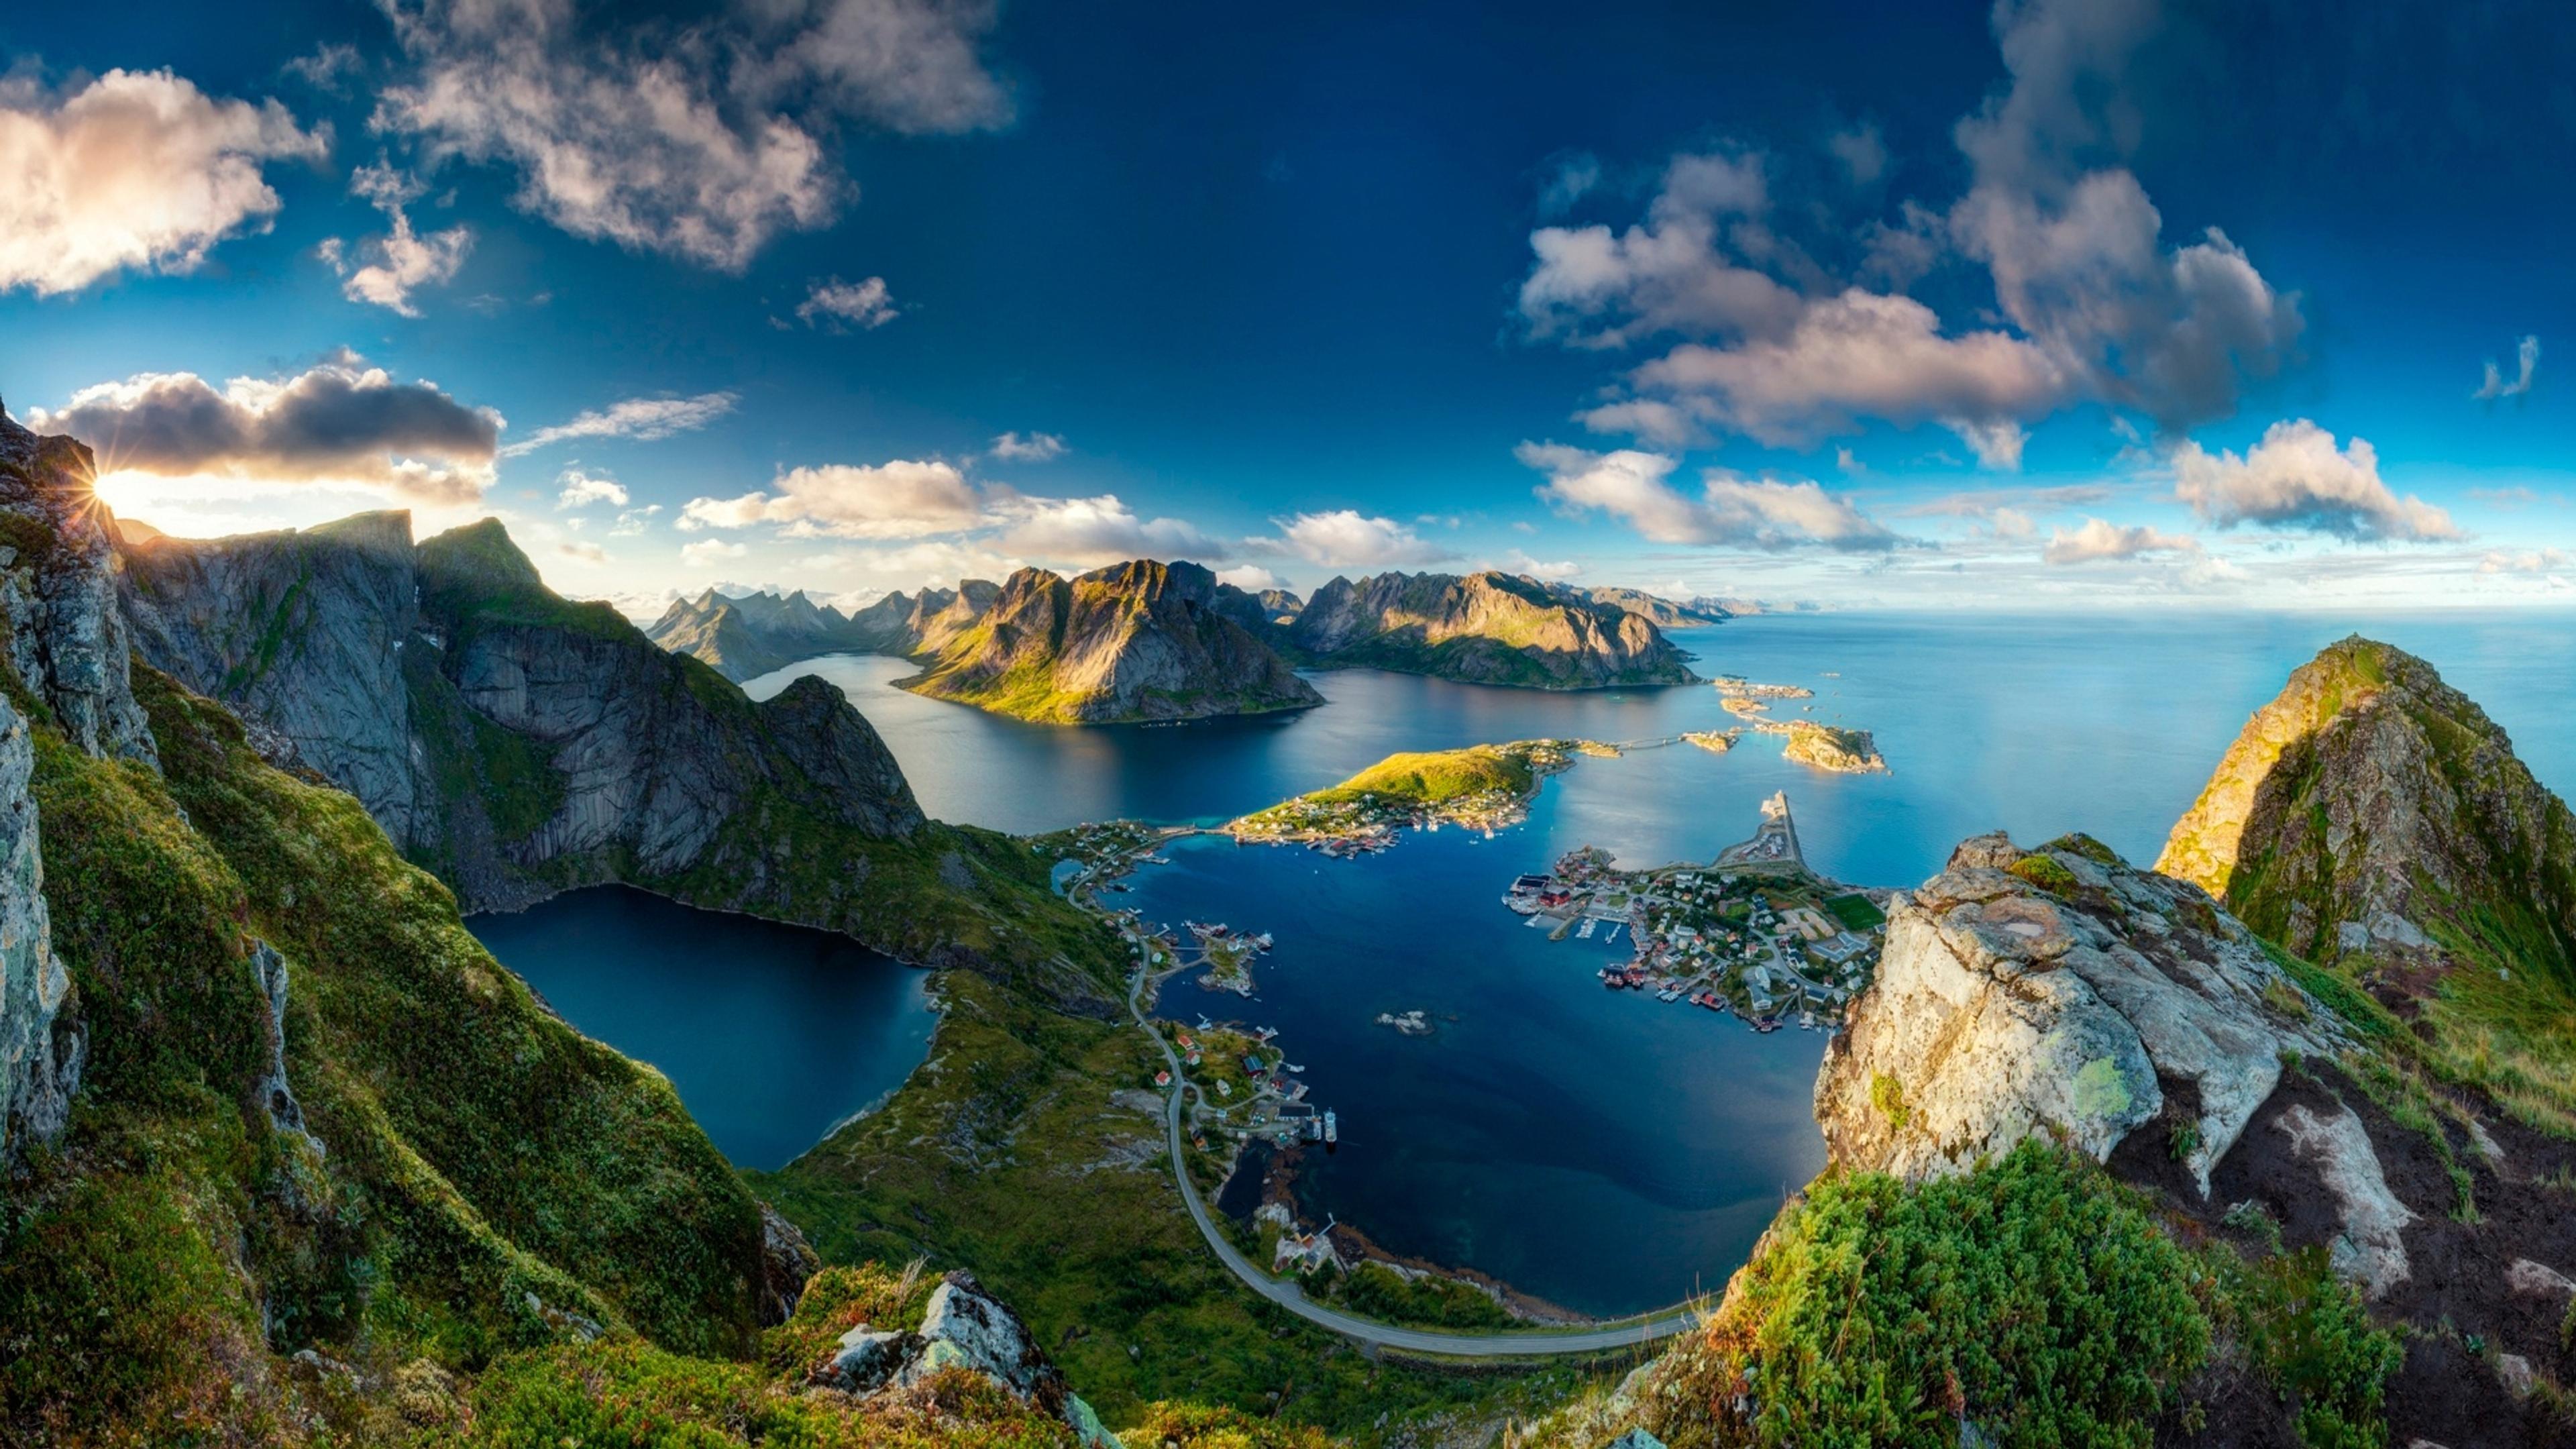 Coffee And Cars >> Reinebringen Norway - Stunning landscape Wallpaper Download 3840x2160